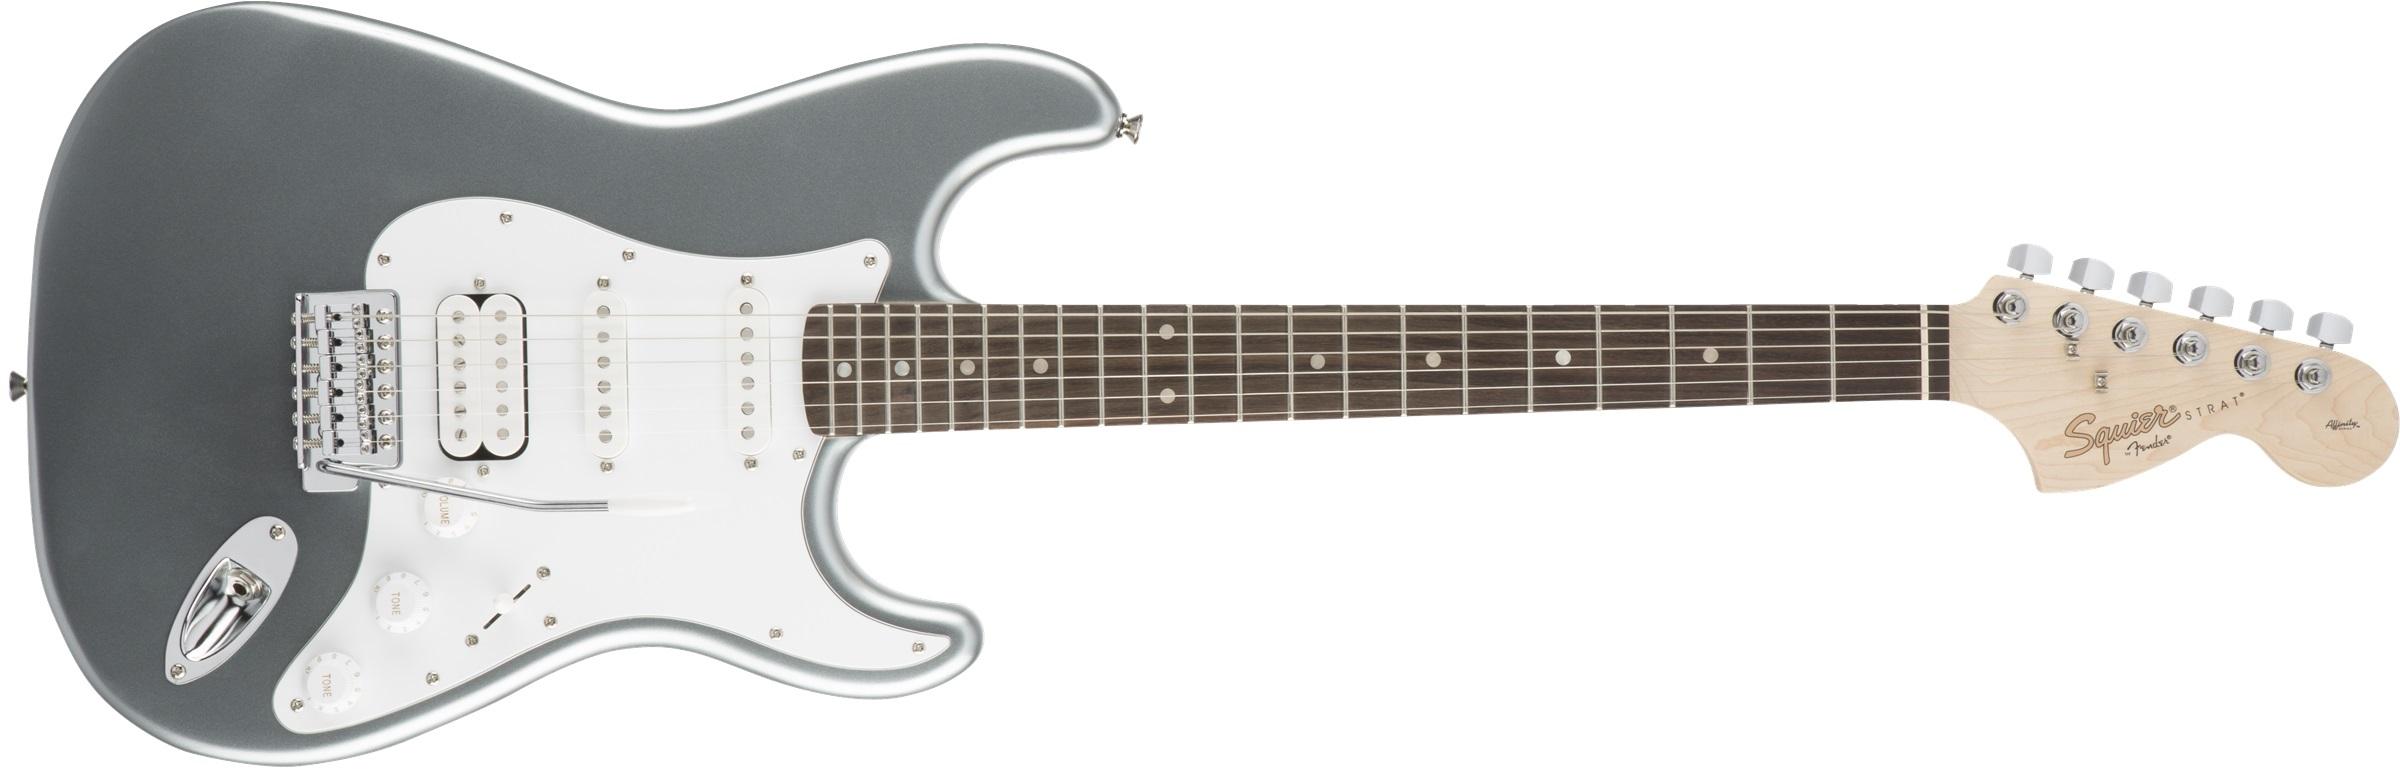 Fender Squier Affinity Stratocaster HSS SLS RW